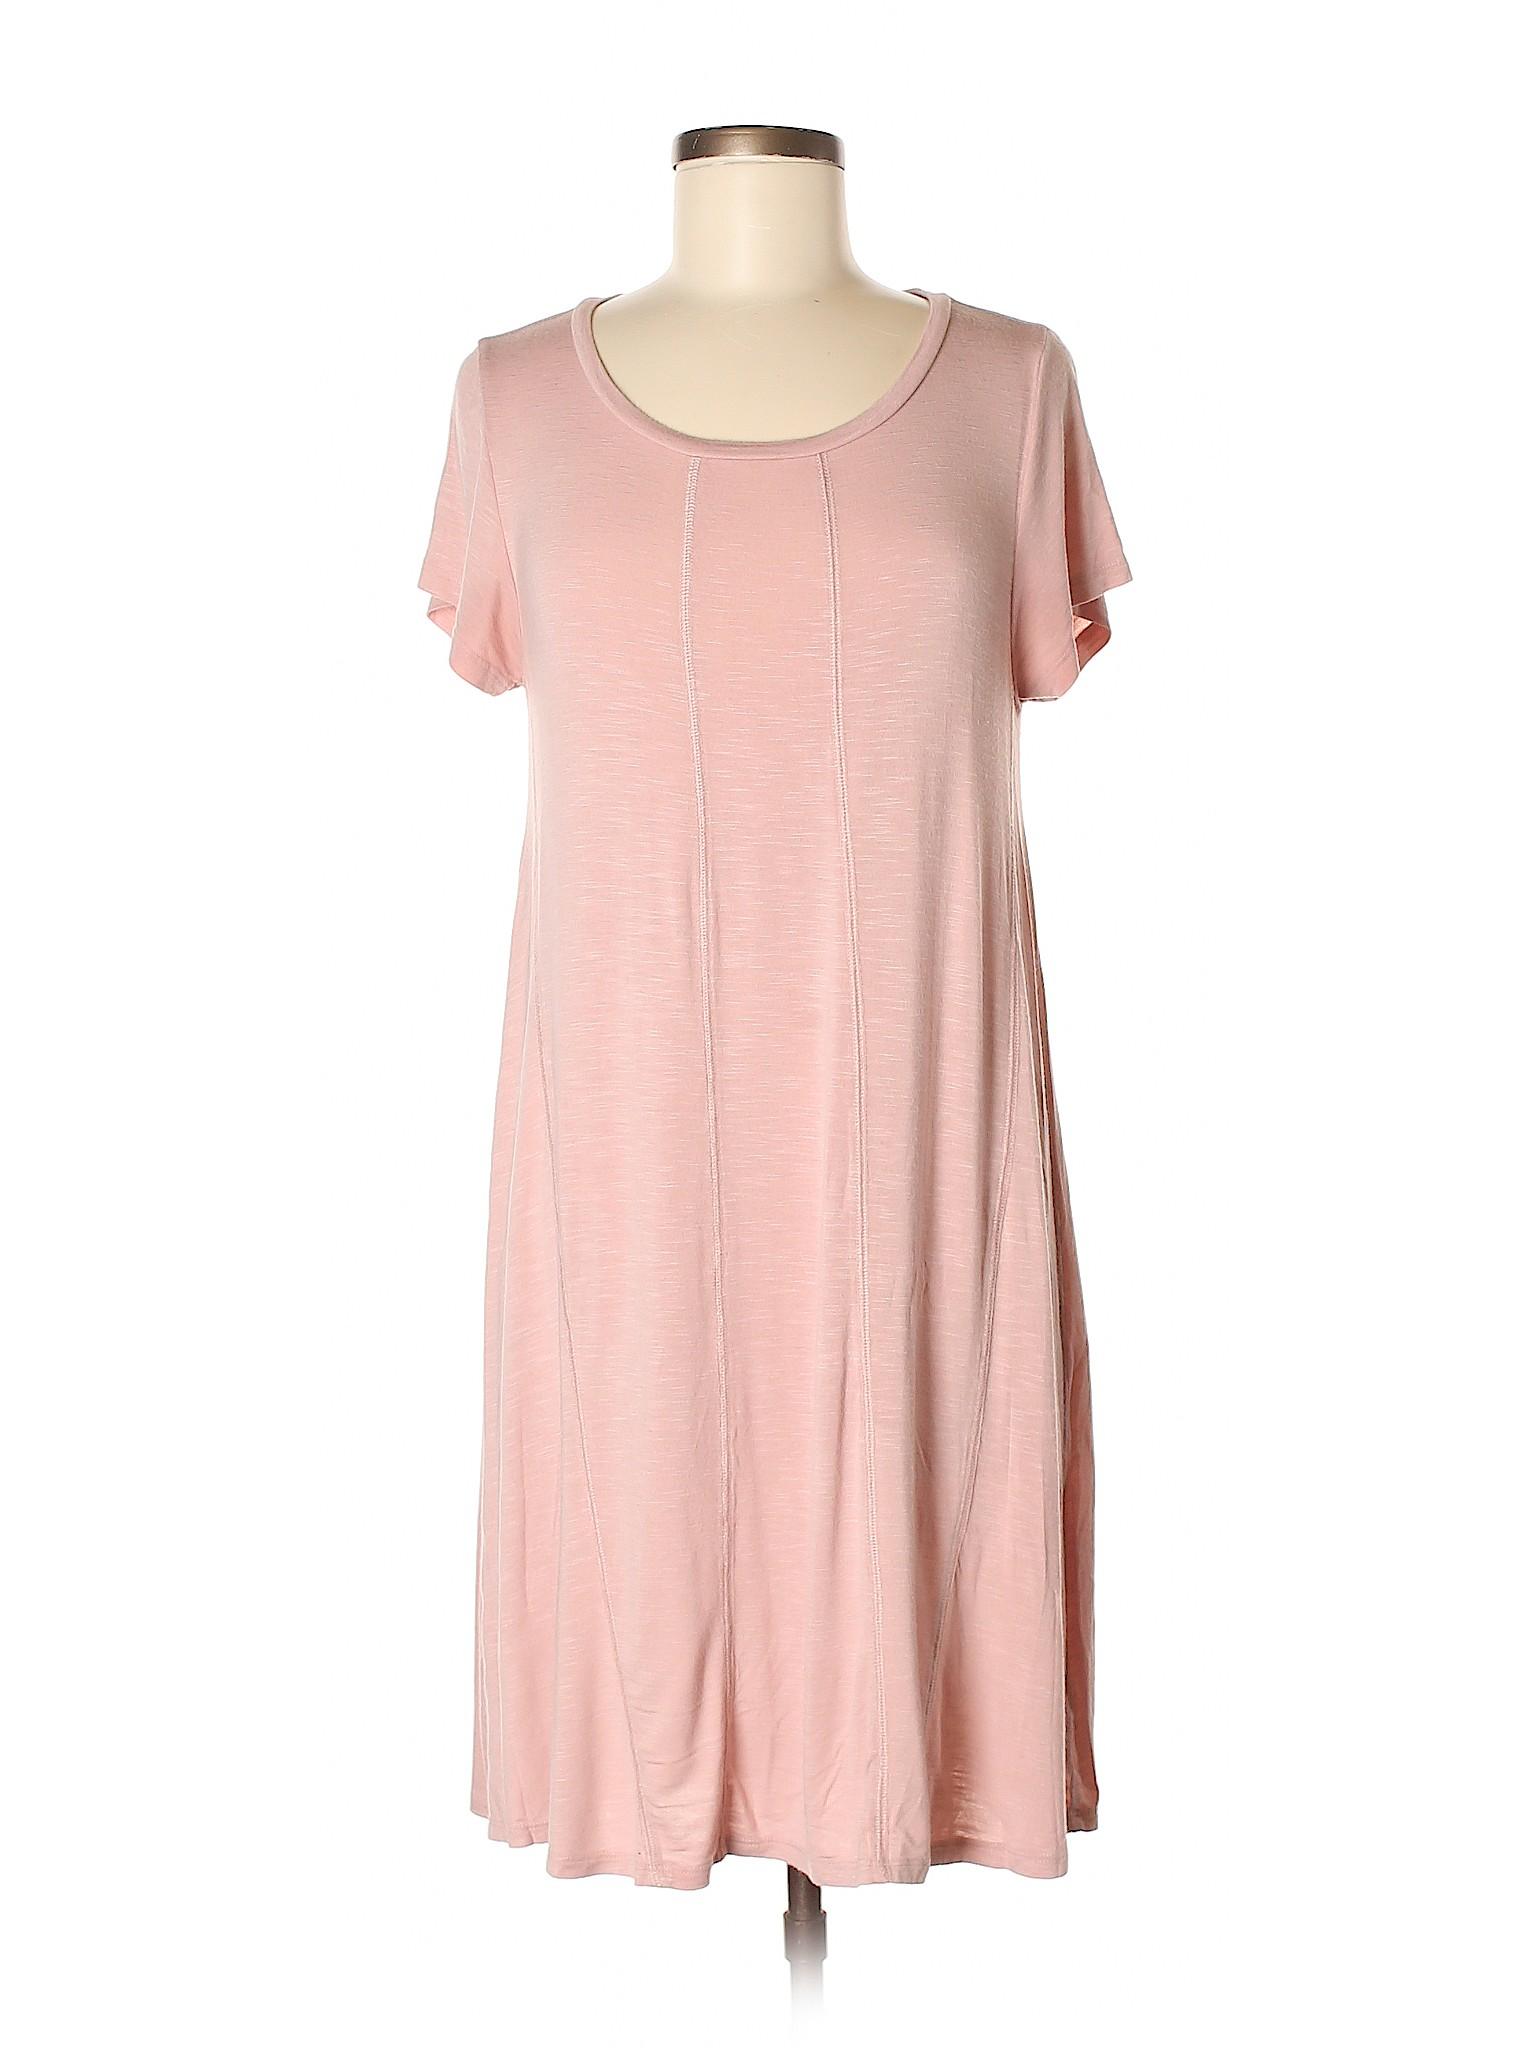 Oak and Casual Dress Olive Selling xwB0qE